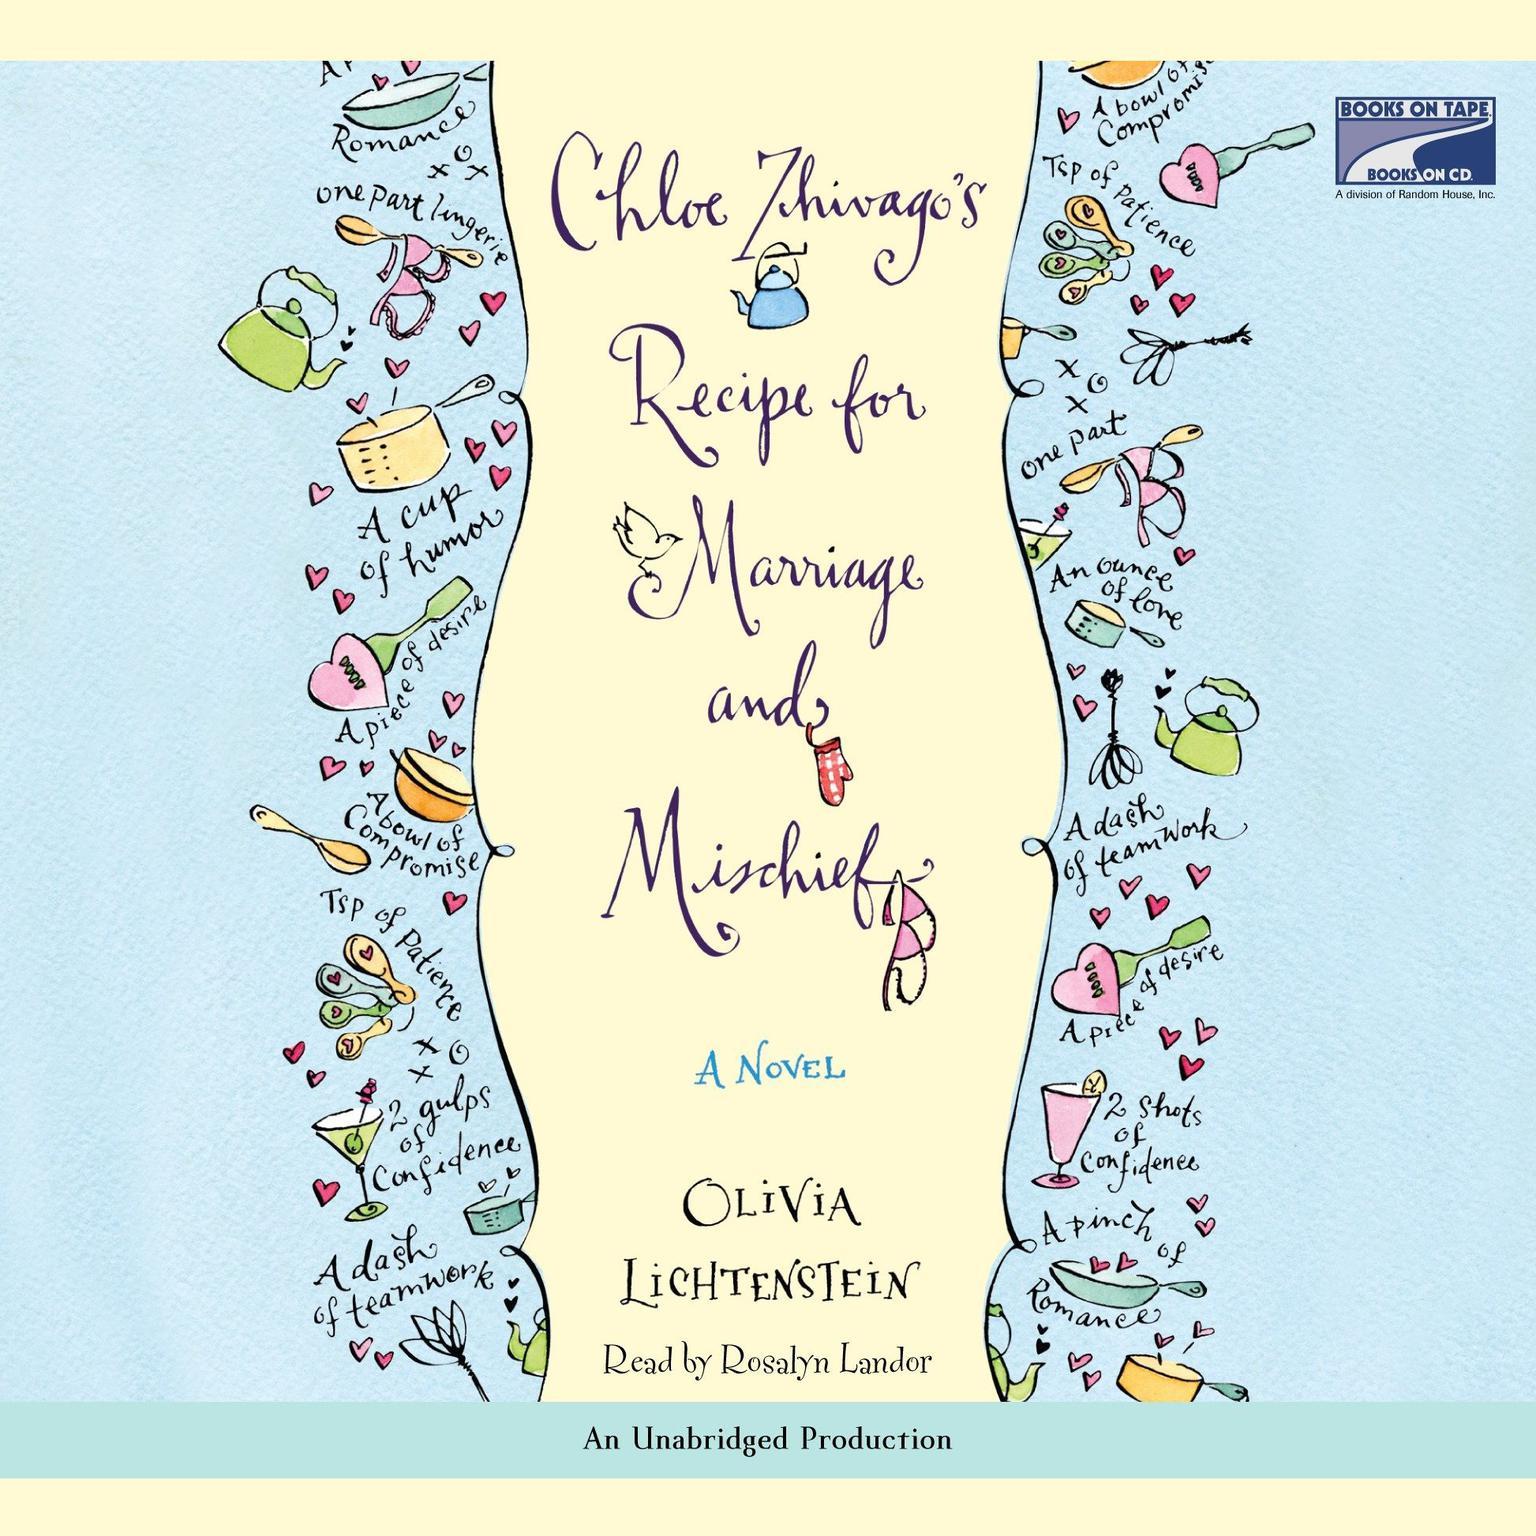 Chloe Zhivagos Recipe for Marriage and Mischief: A Novel Audiobook, by Olivia Lichtenstein